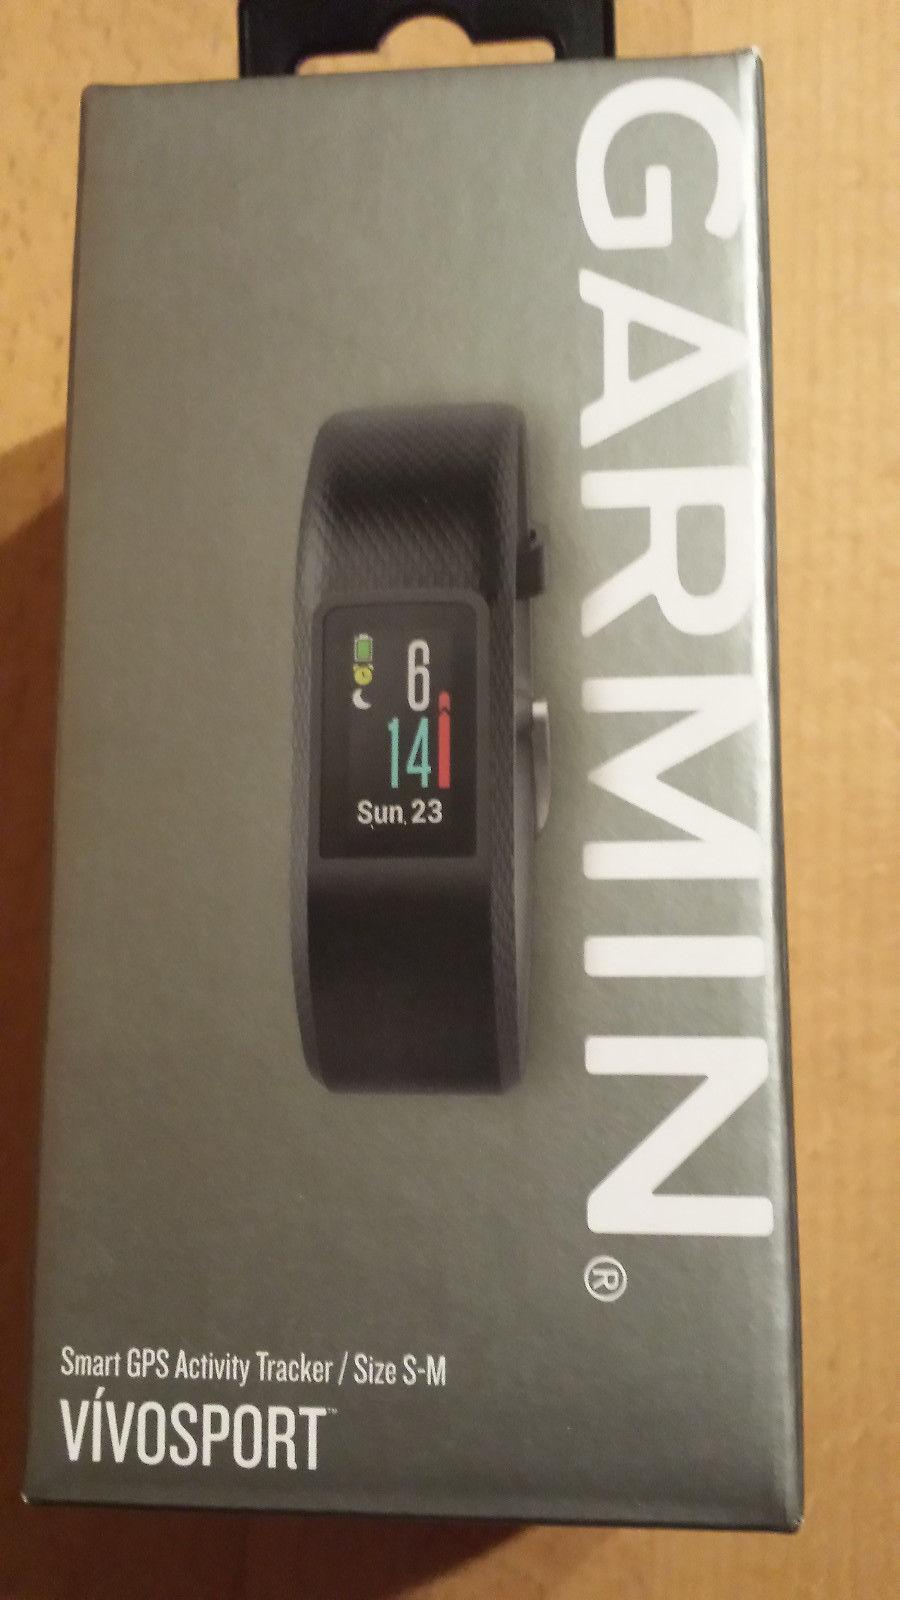 Garmin Vivosport GPS NEU Originalverpackt Ungeöffnet Rechnung Dunkelgrau S/M